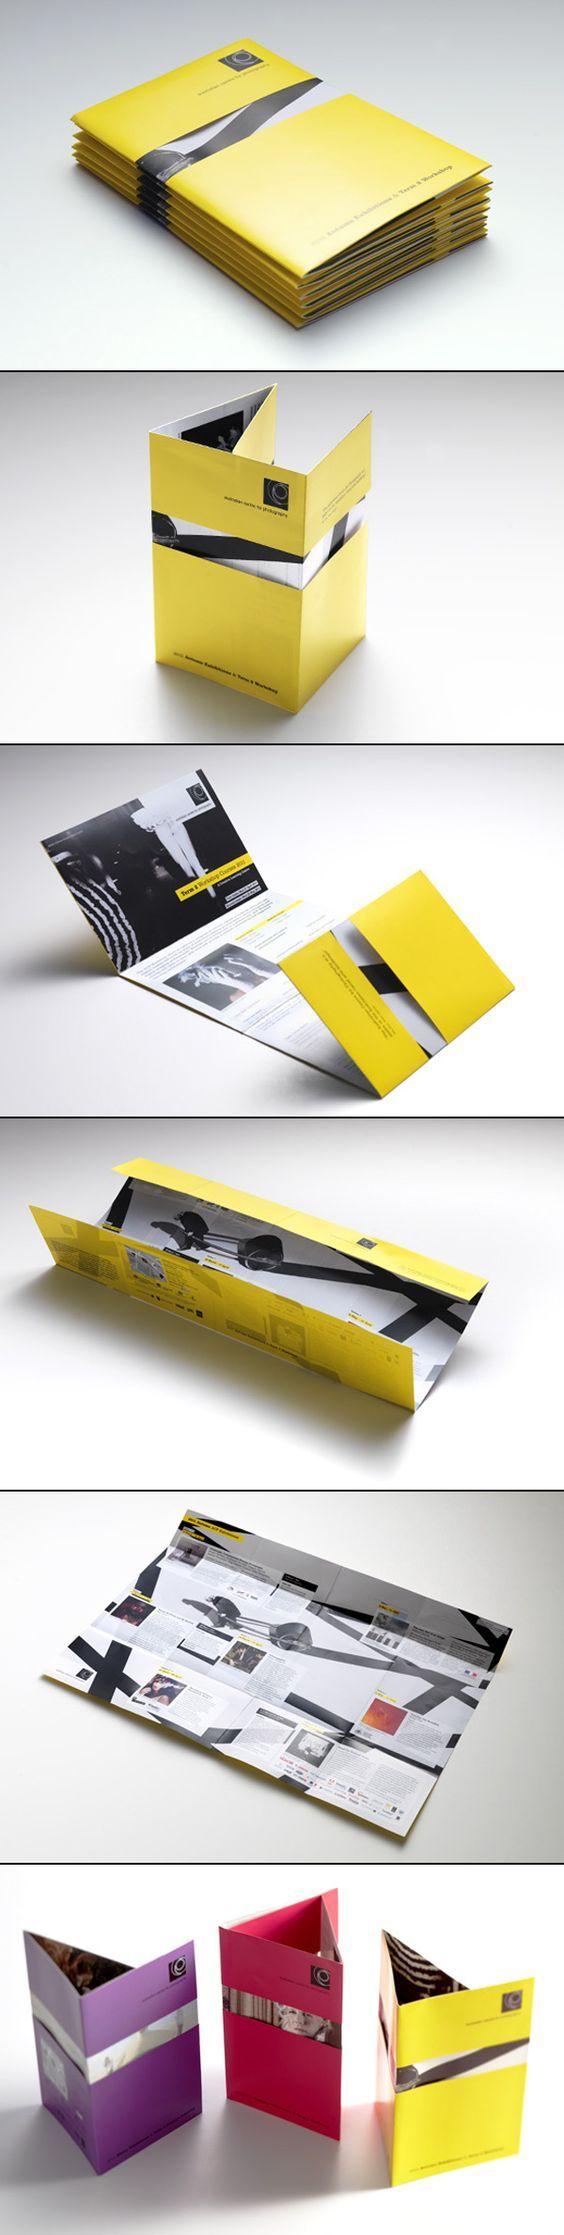 Relevância 2 - possível cartilha mapa, dobrável Australian Centre for Photography Brochure | Design by Messy: